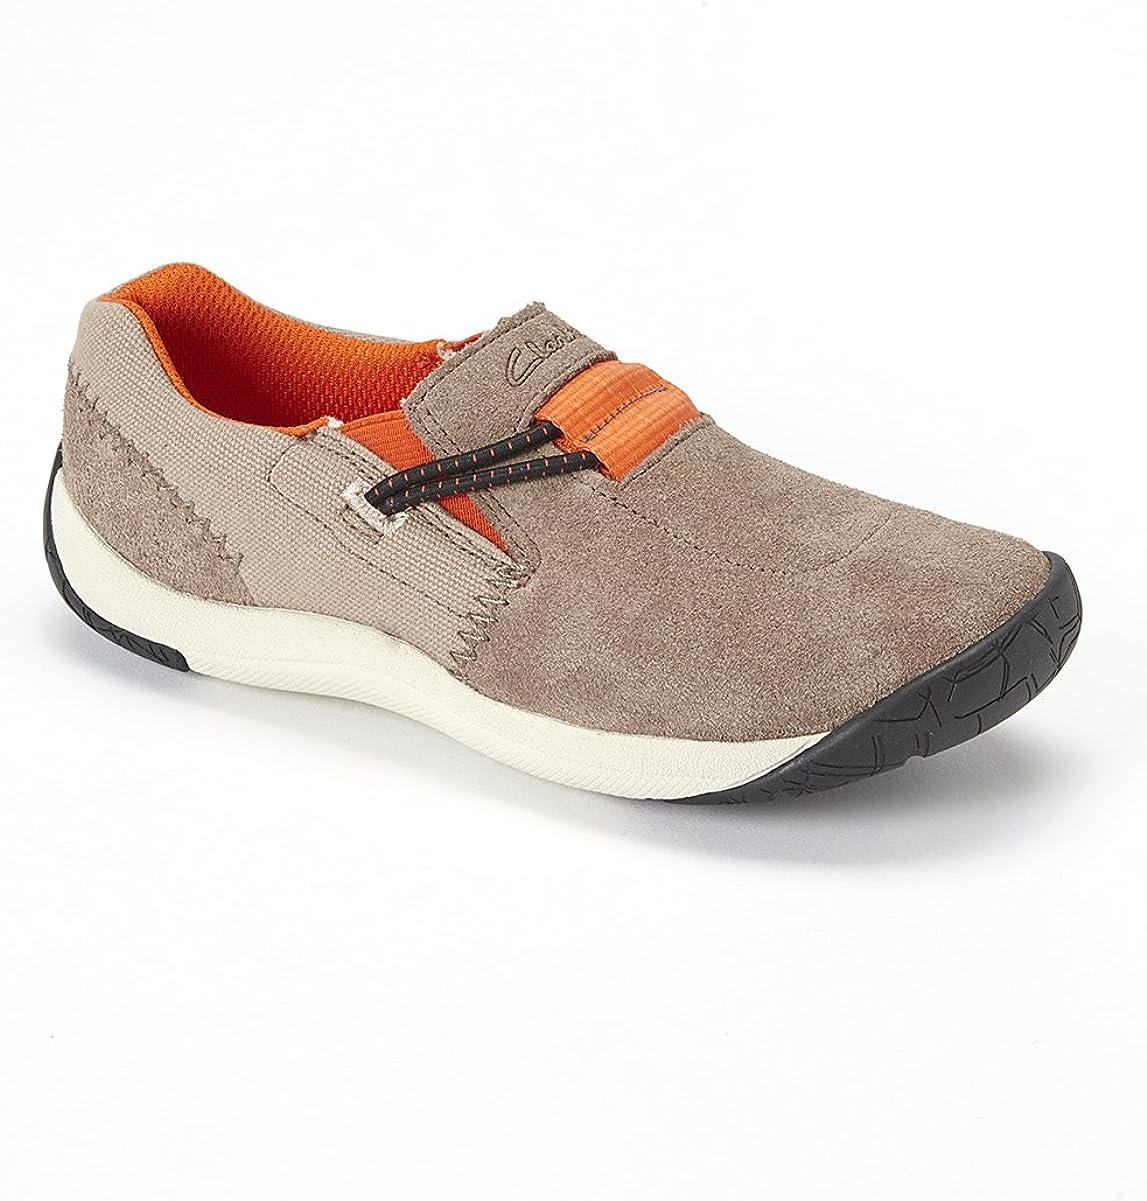 María espiritual pureza  Clarks Brown Tay Fun J Leather Slip-on Sneaker 26100320 Us Size 4w:  Amazon.co.uk: Shoes & Bags